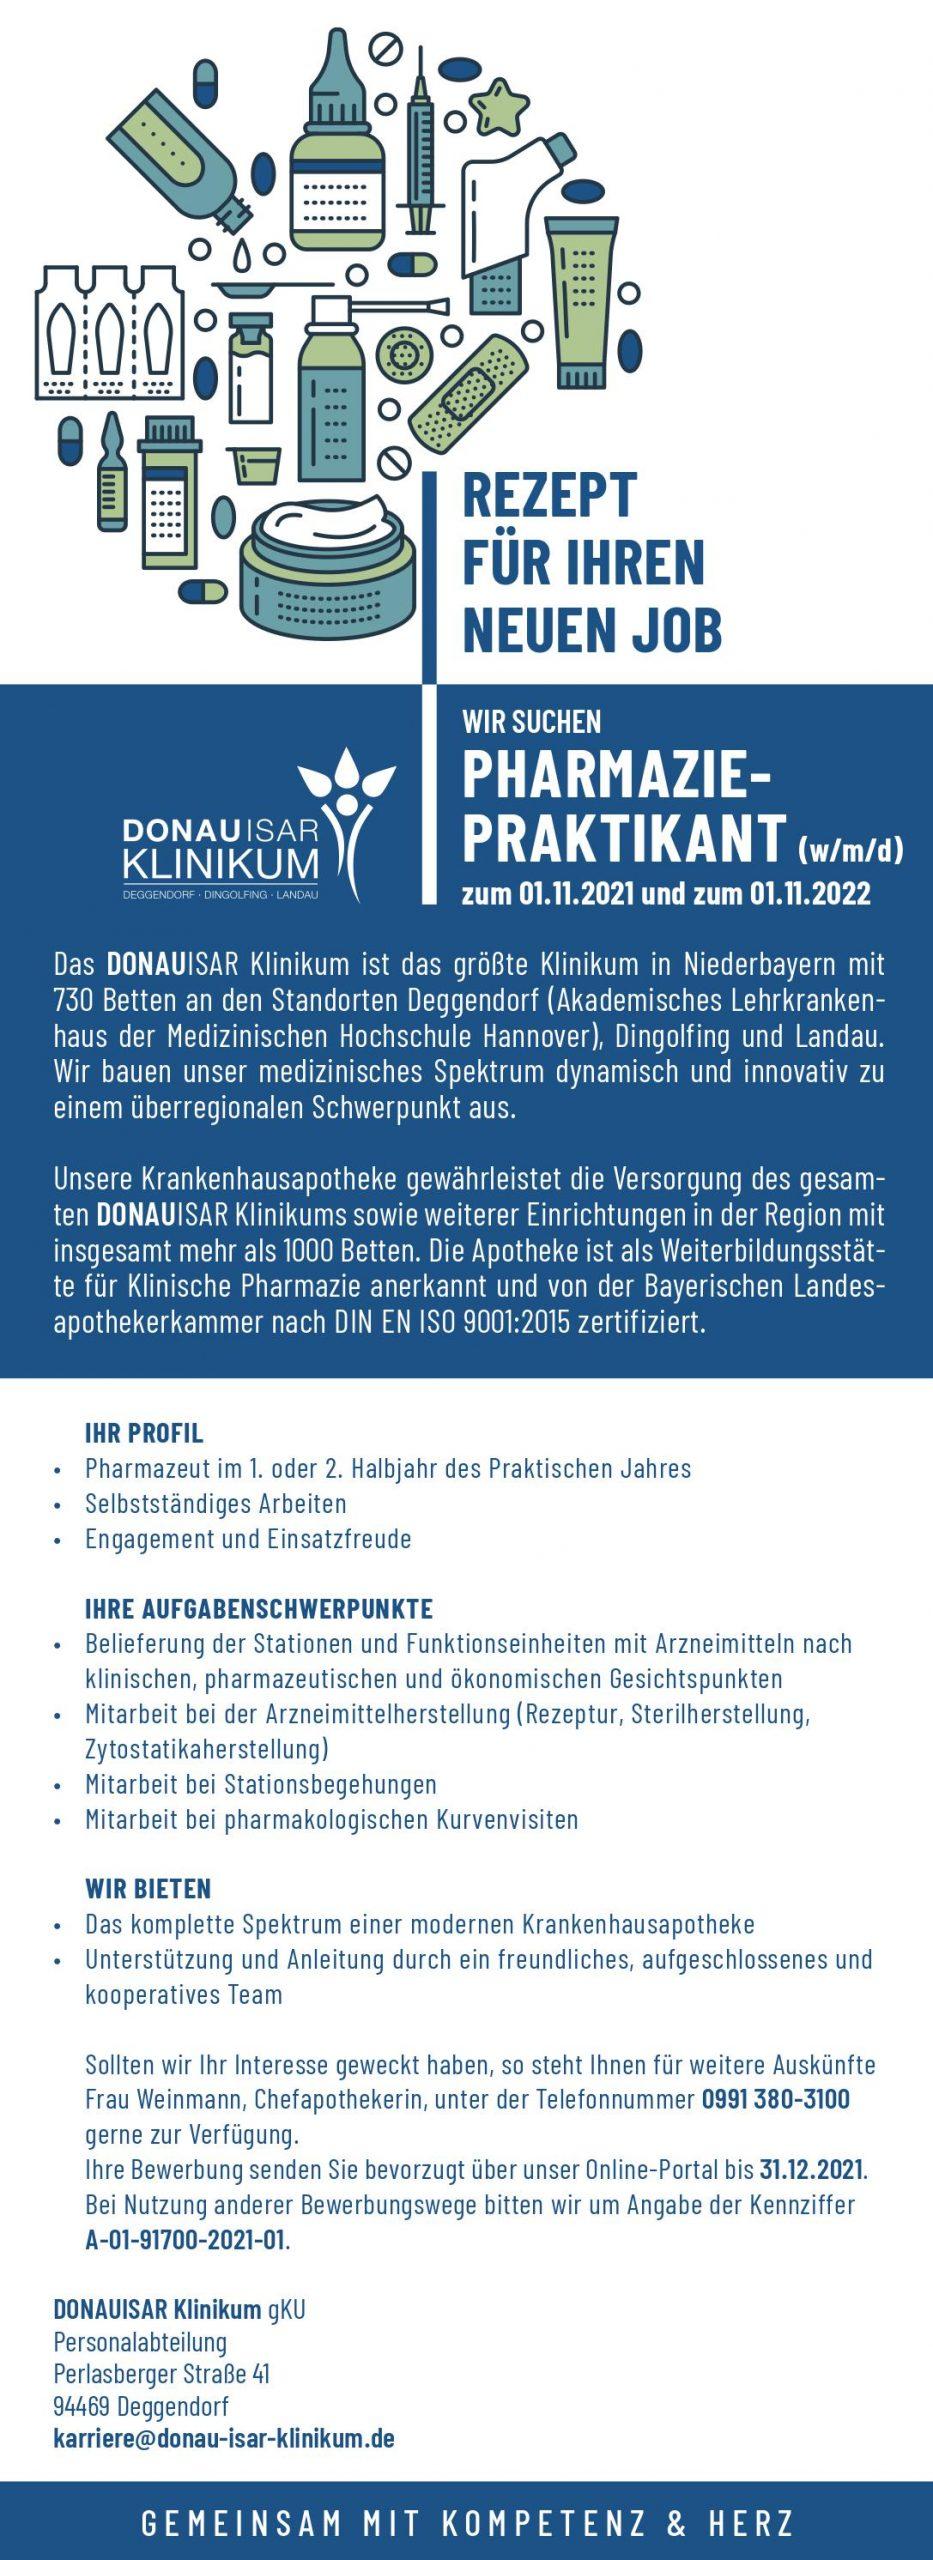 You are currently viewing PhiP (m/w/d) im DONAUISAR Klinikum Deggendorf ab 11/2021 und 11/2022